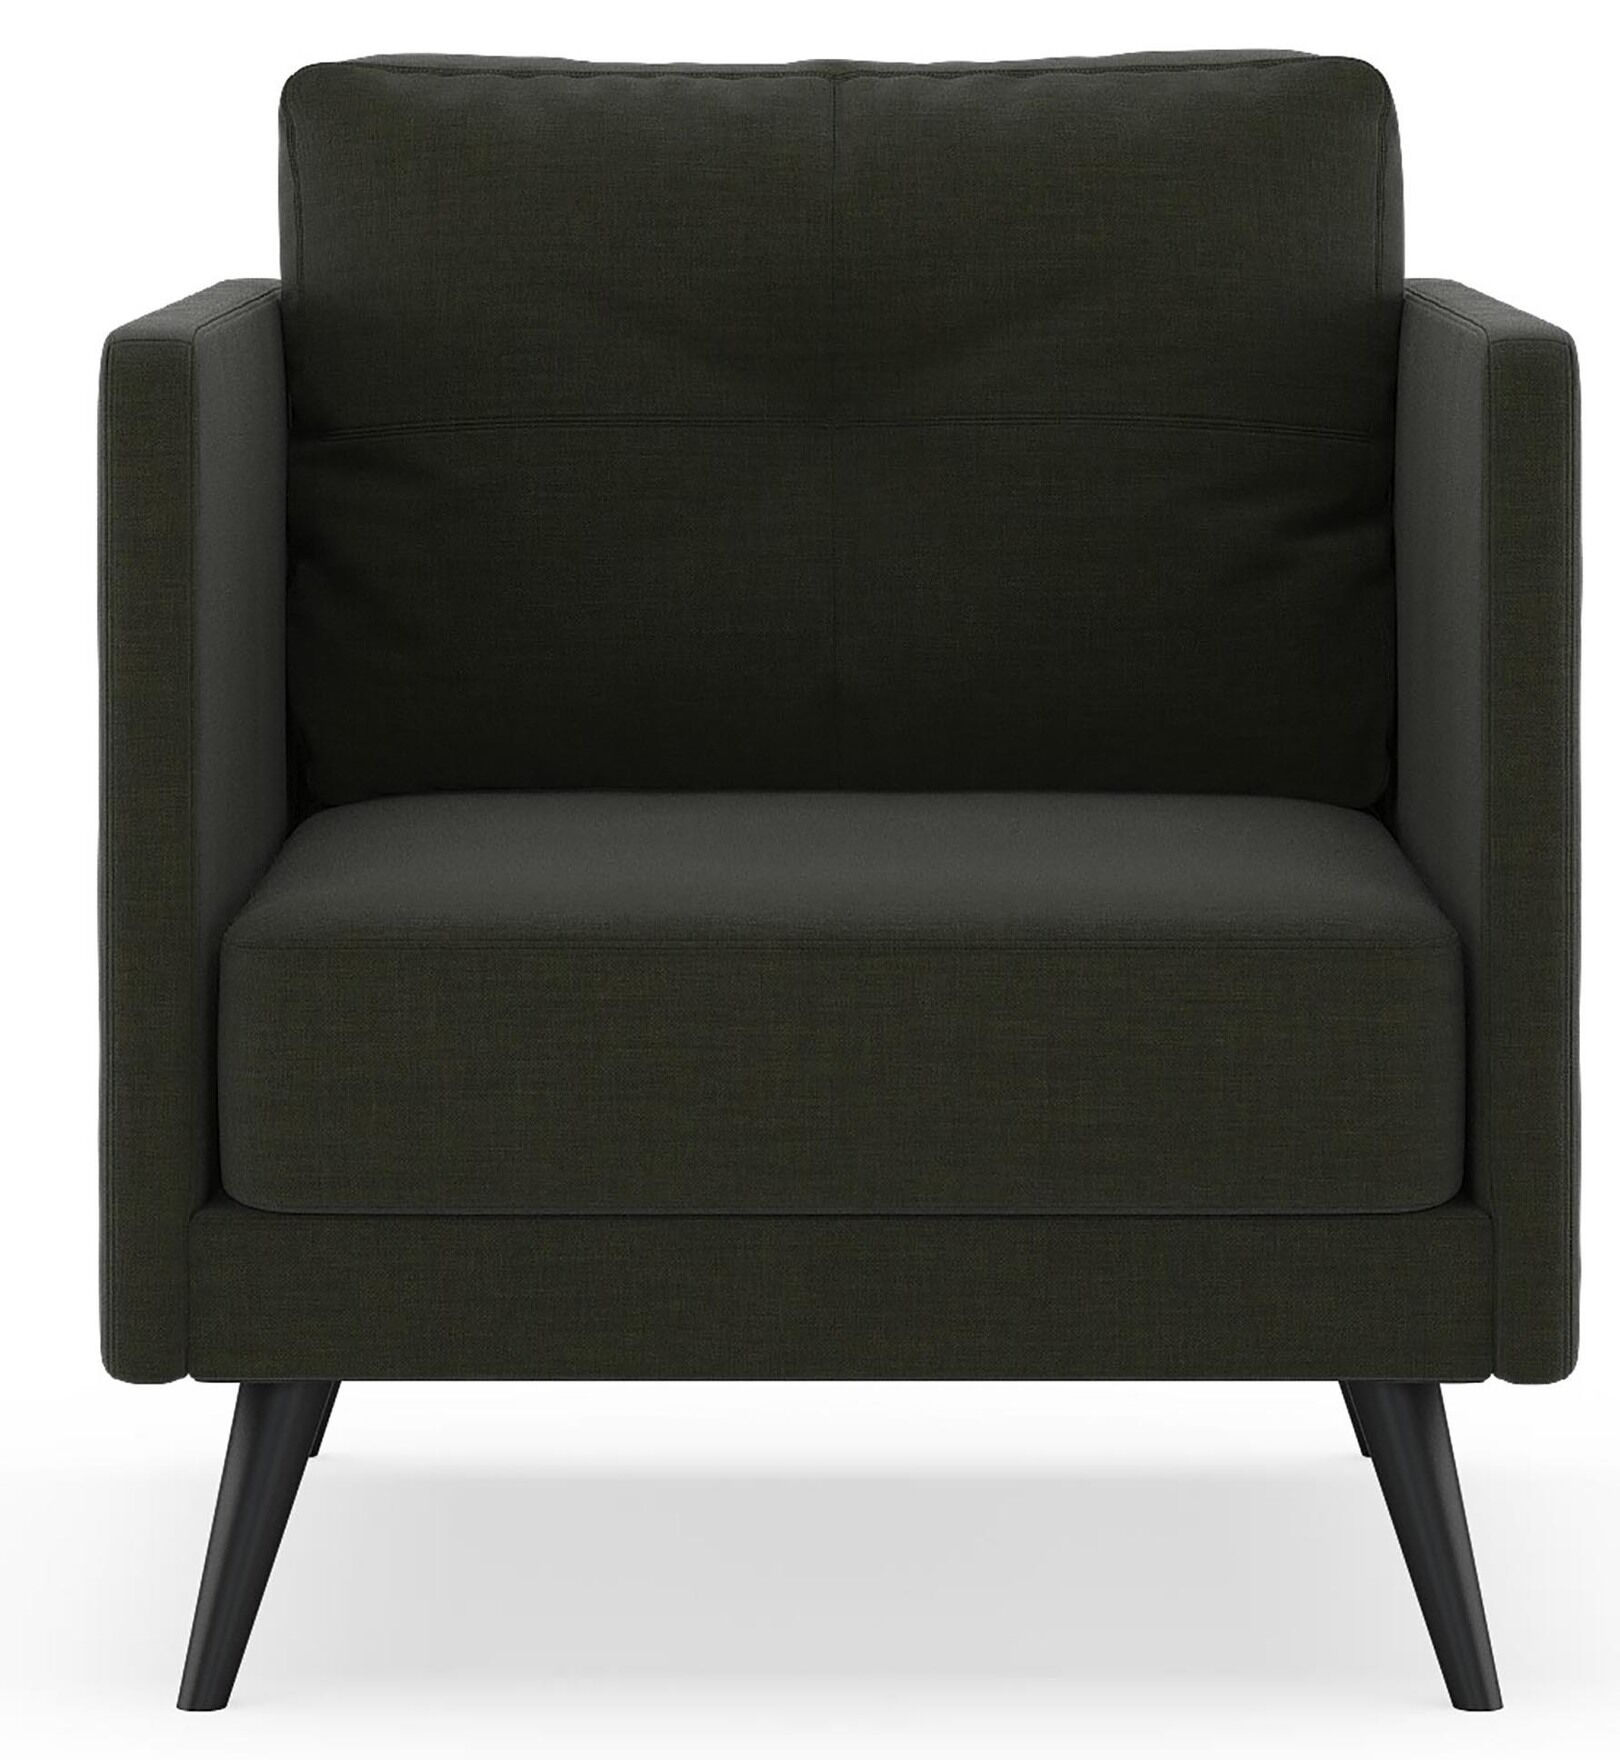 Croom Armchair Upholstery: Stone Blue, Finish: Brass